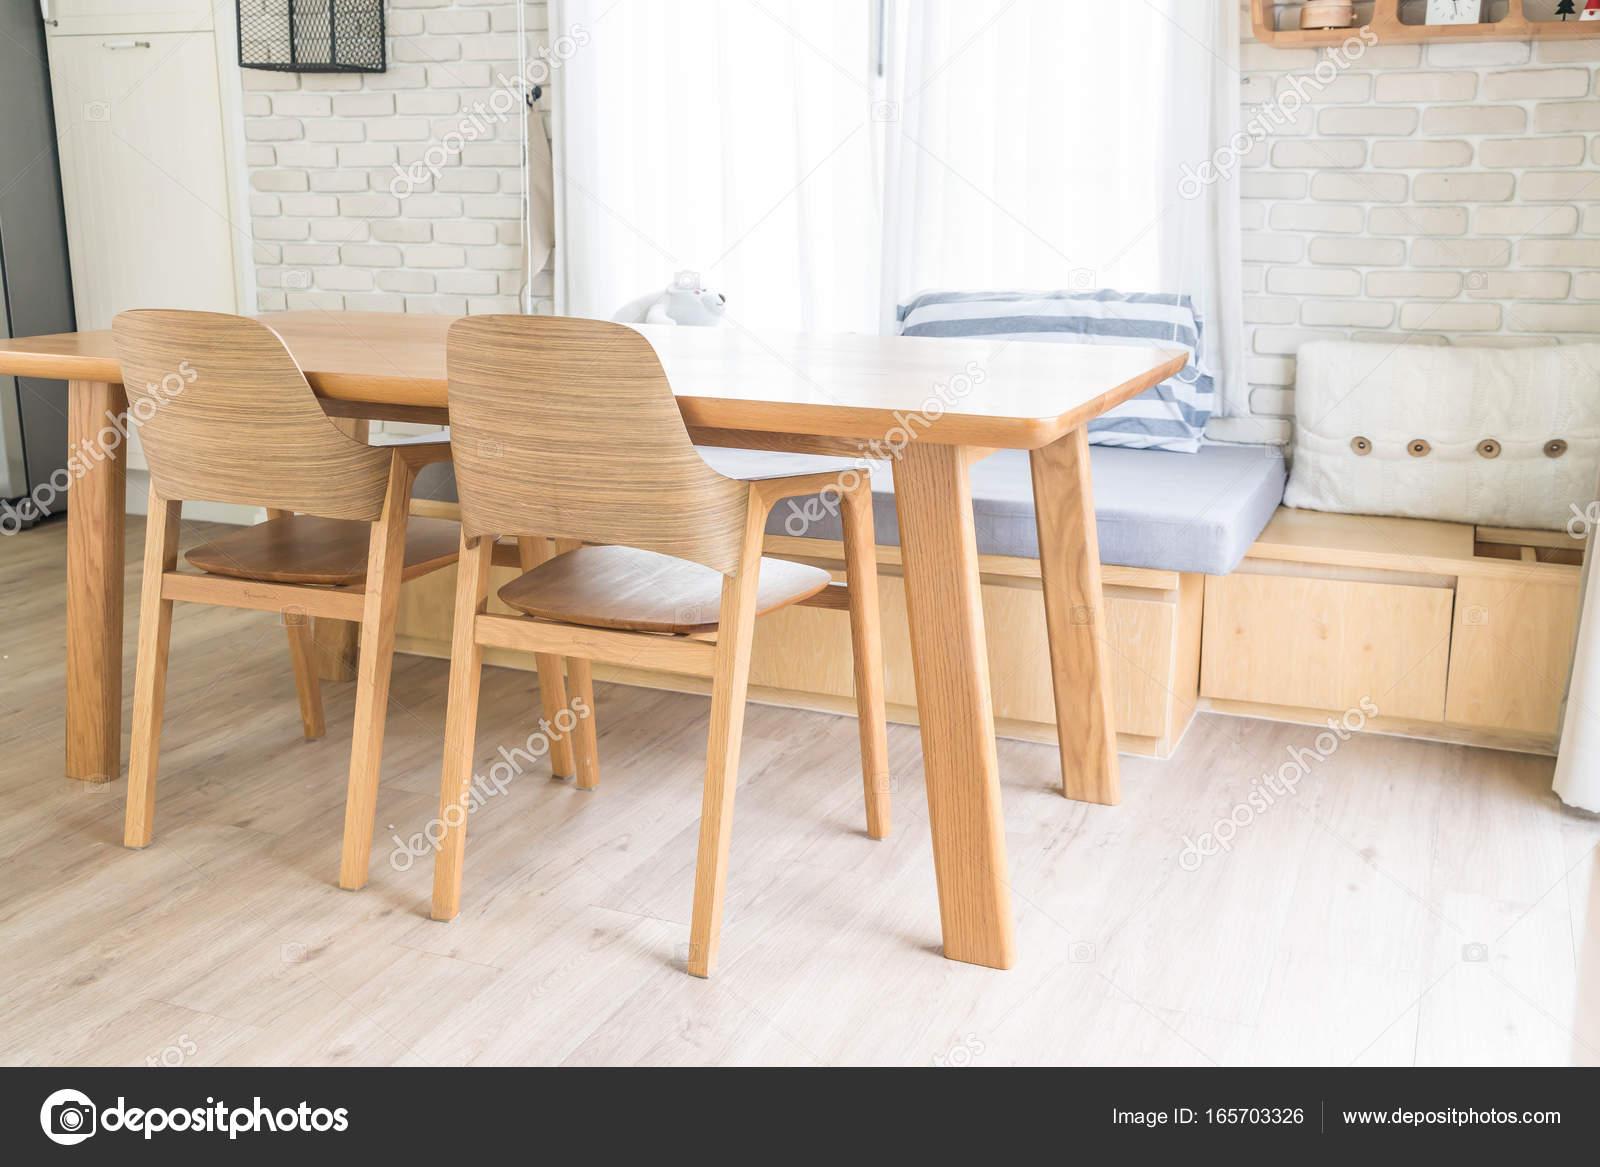 decoración de mesa comedor — Fotos de Stock © topntp #165703326